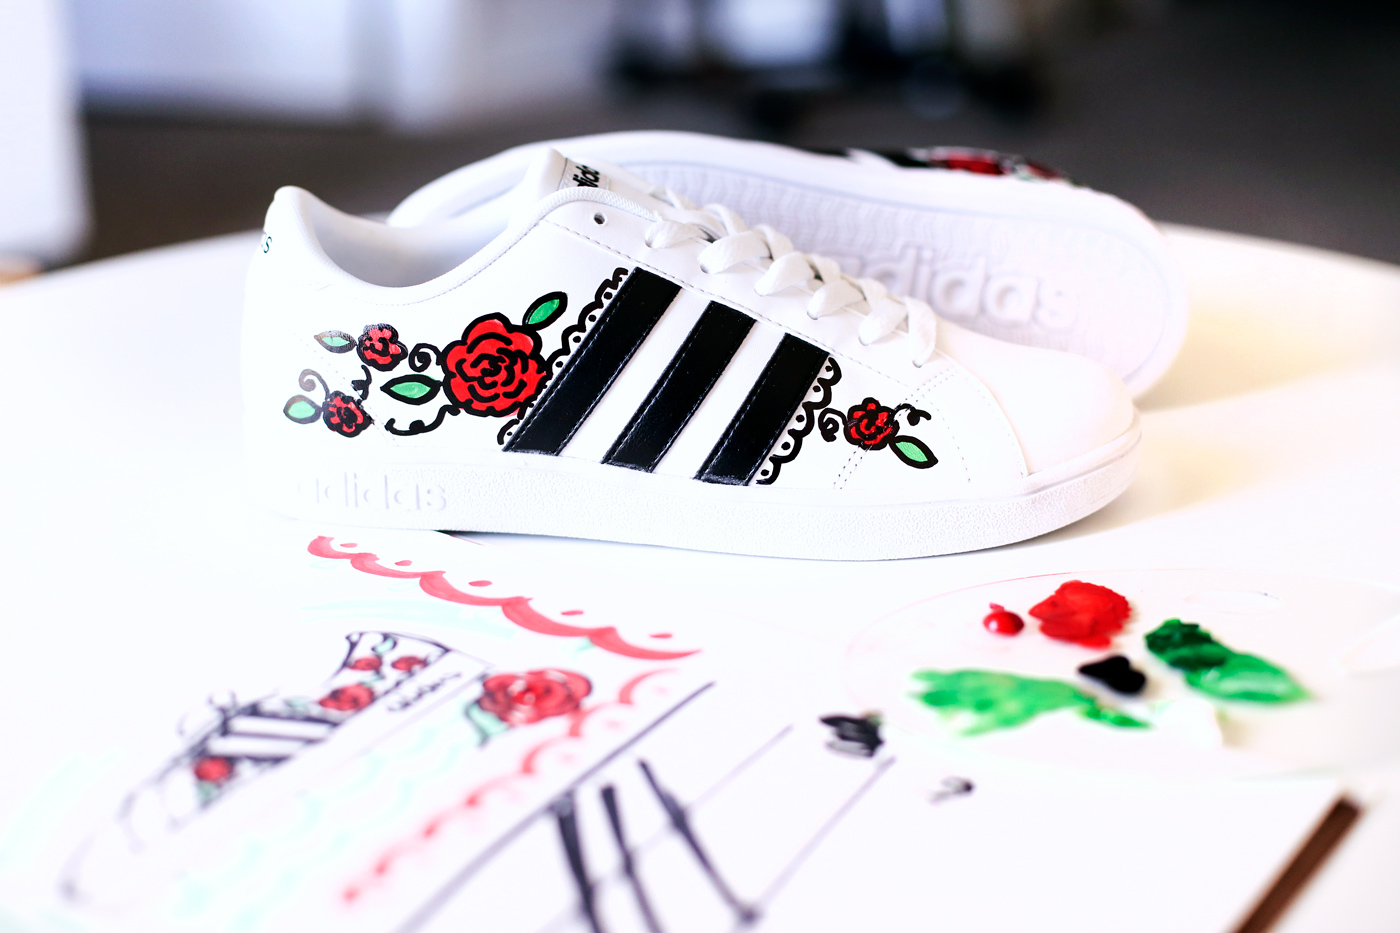 TAOS-Famous-Footwear-Stepforward-Adidas-5